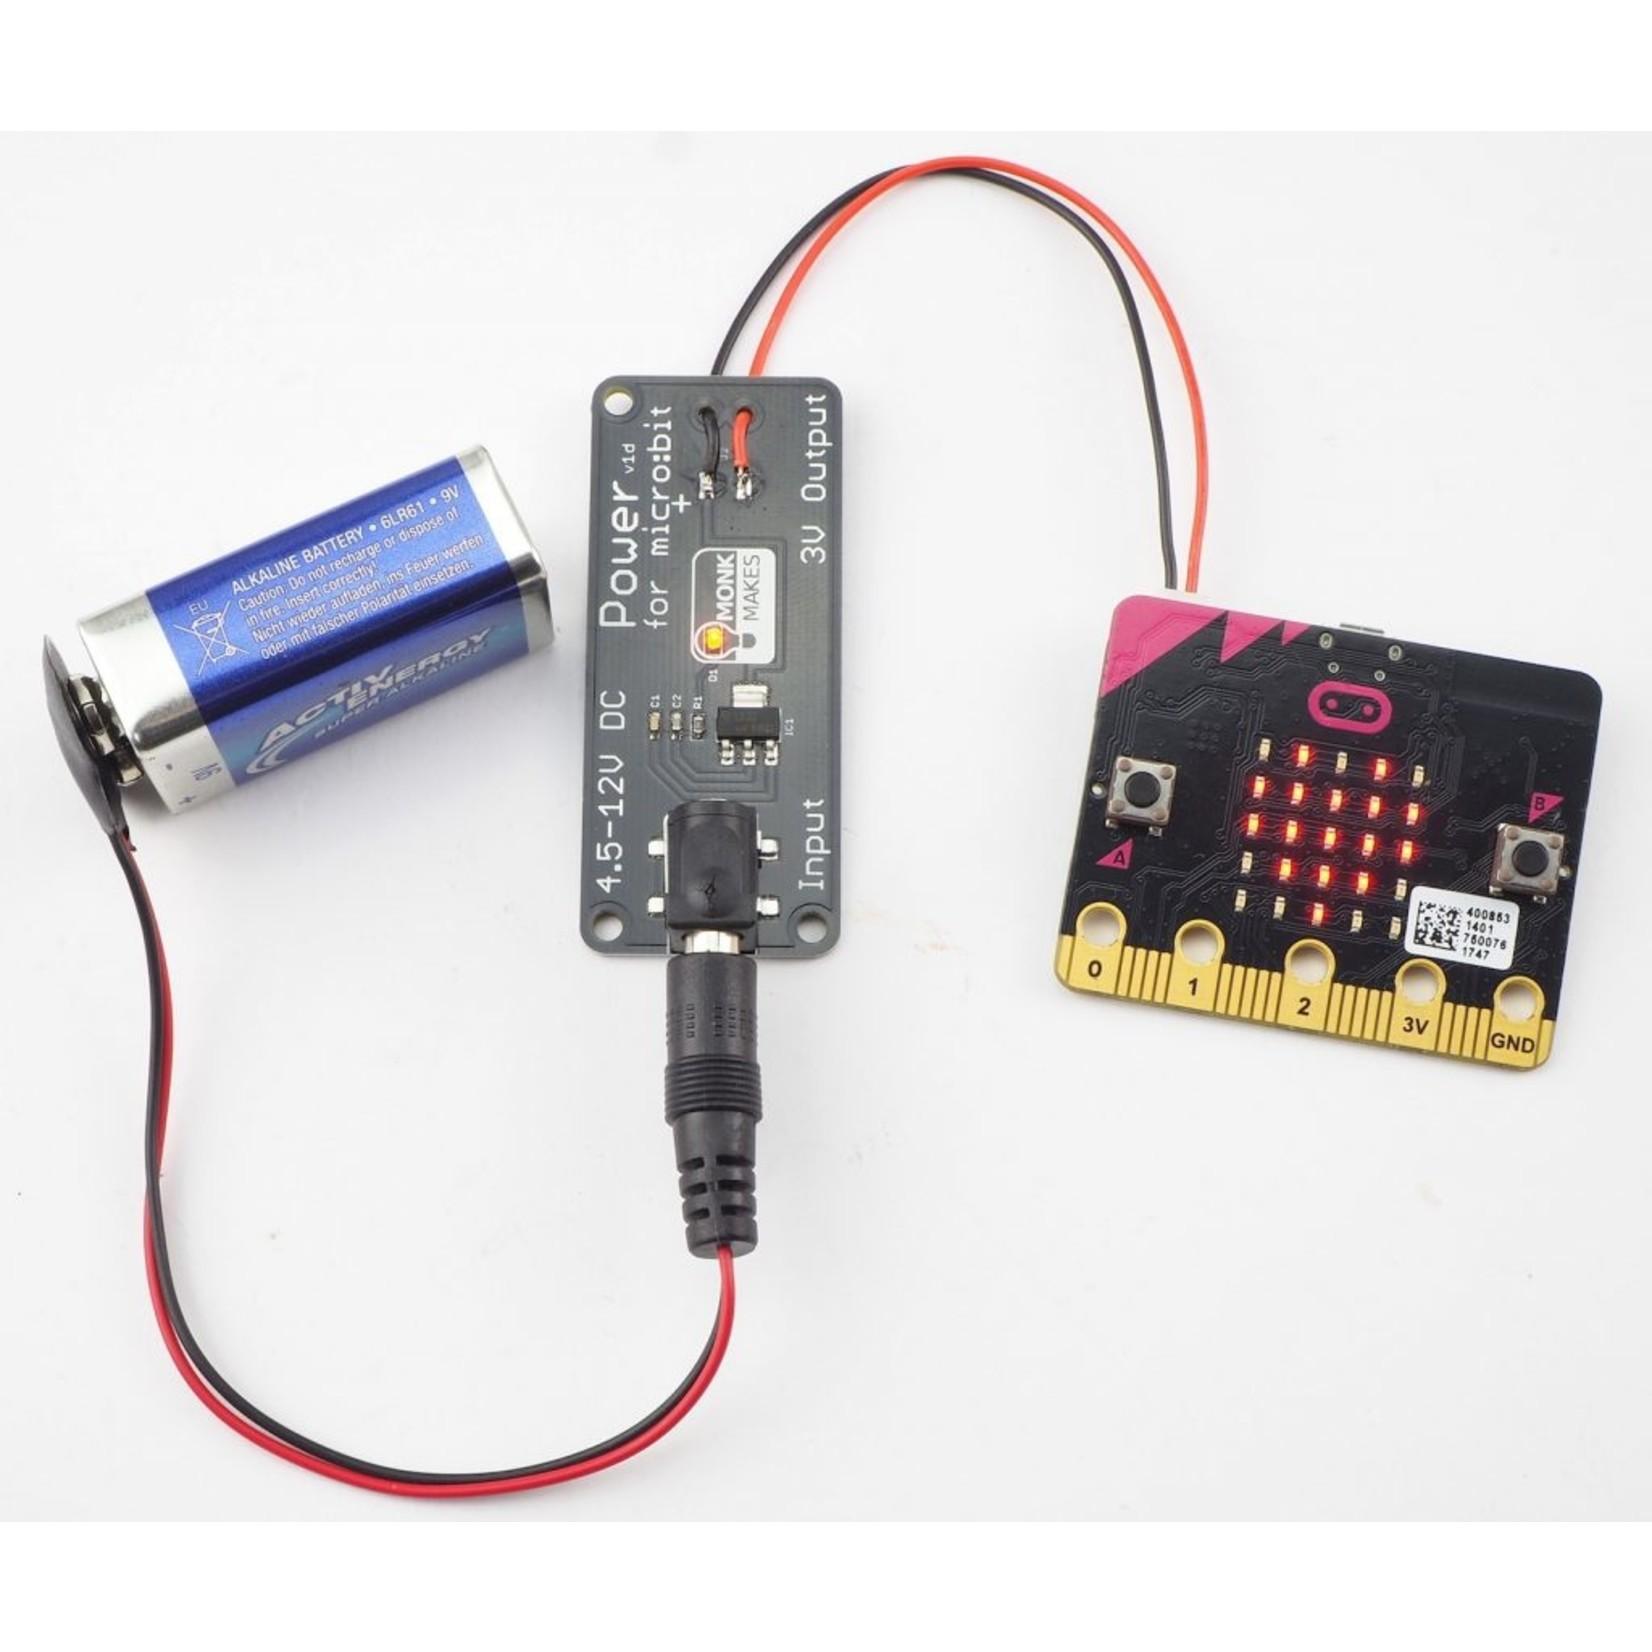 MonkMakes Power for micro:bit